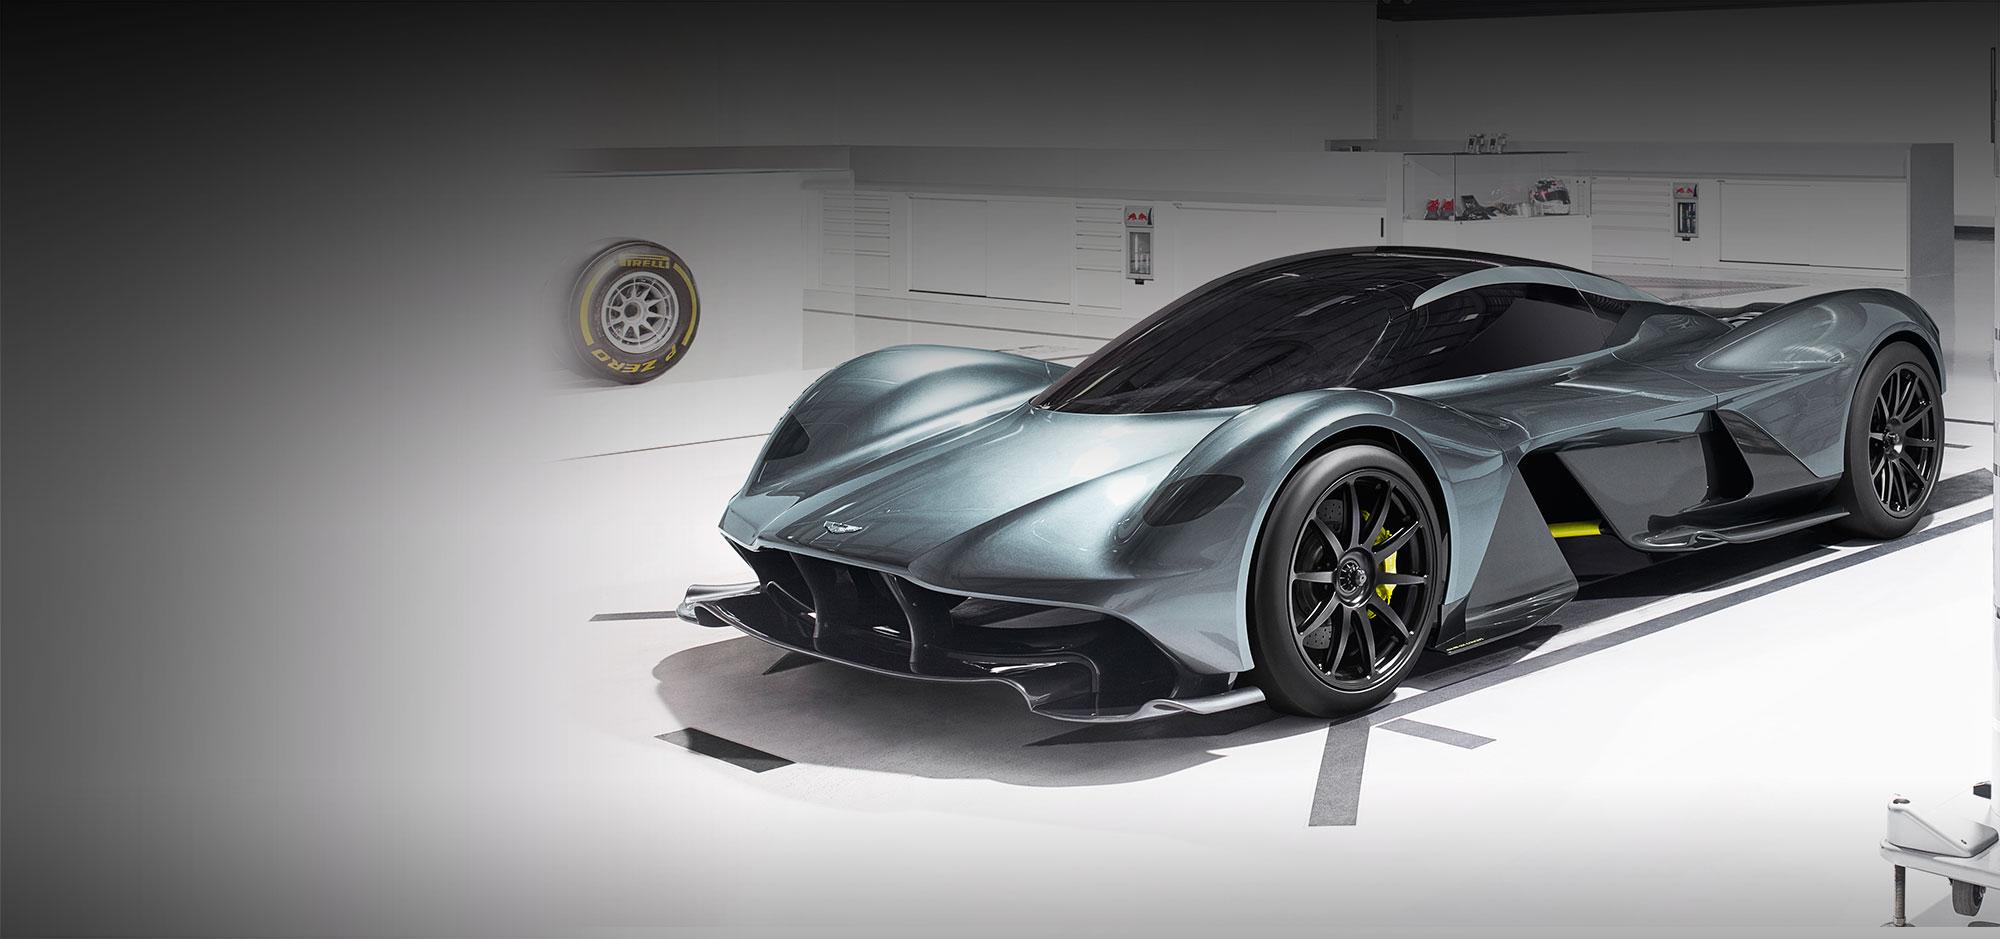 Superbe Aston Martin Valkyrie